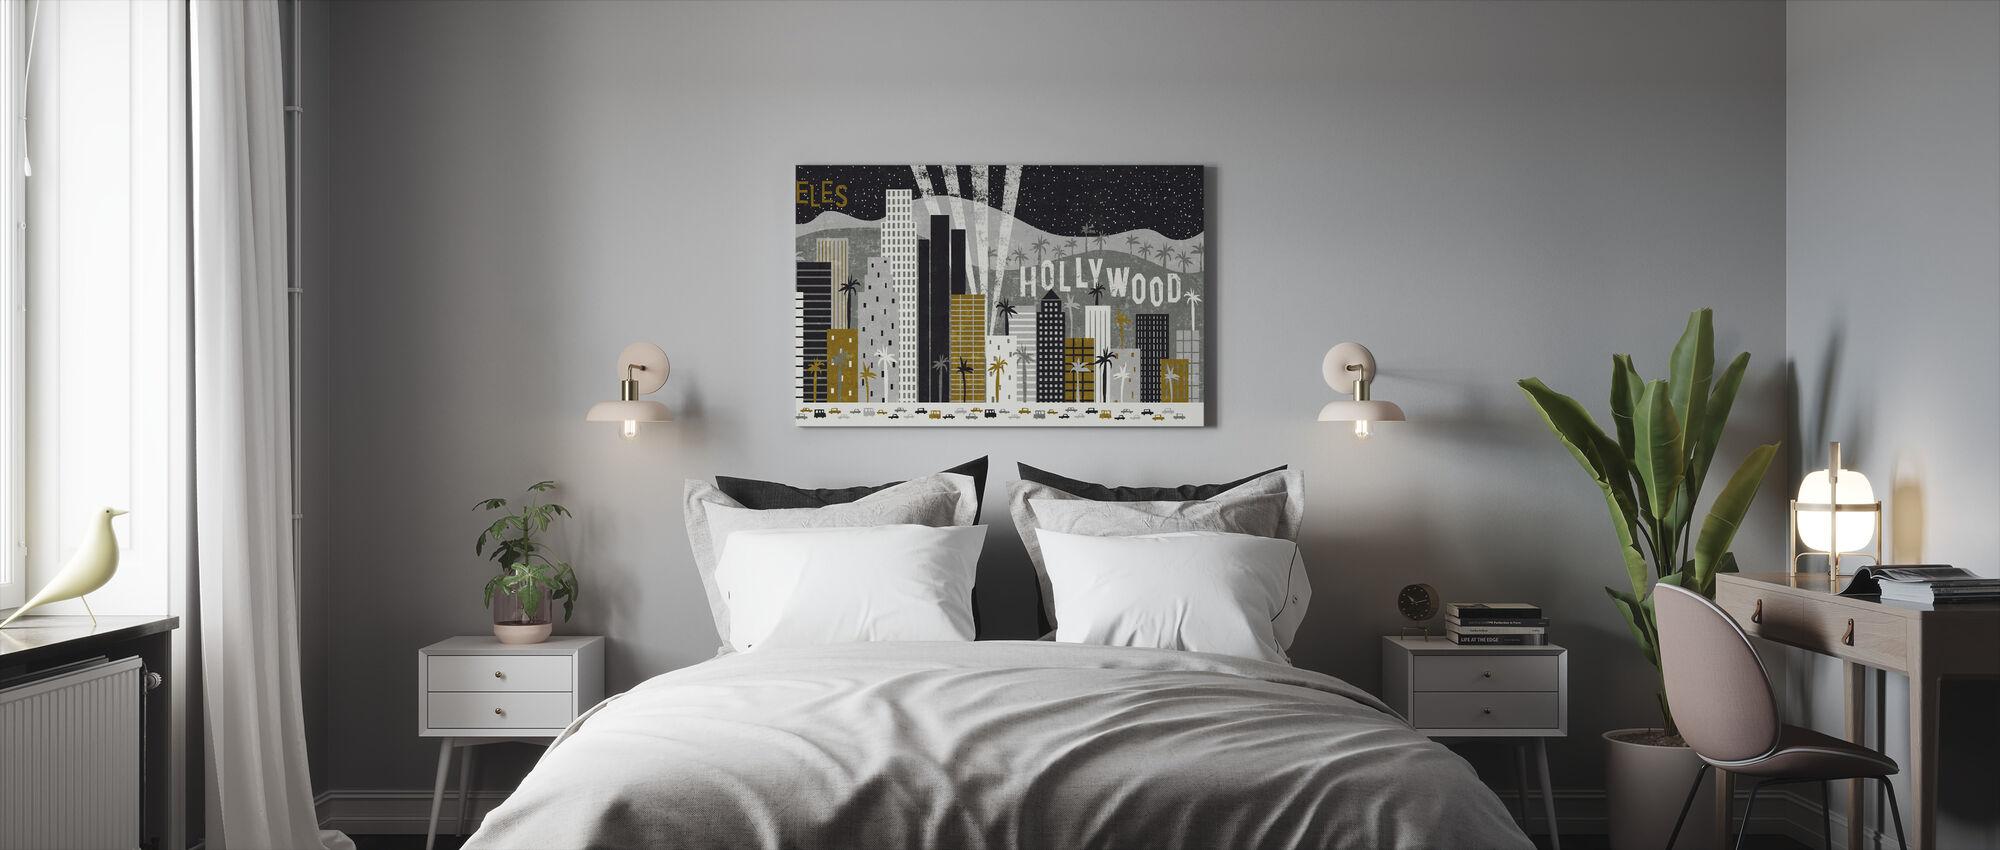 Hey Los Angeles - Canvas print - Bedroom